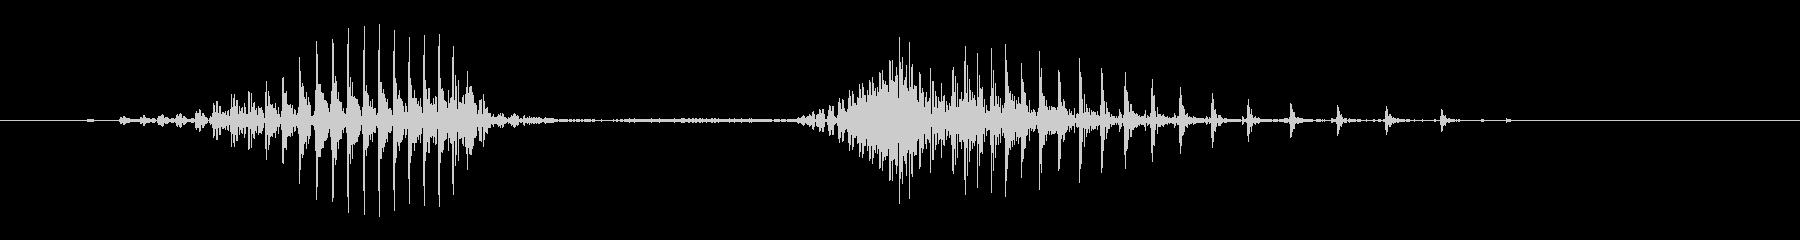 replayの未再生の波形